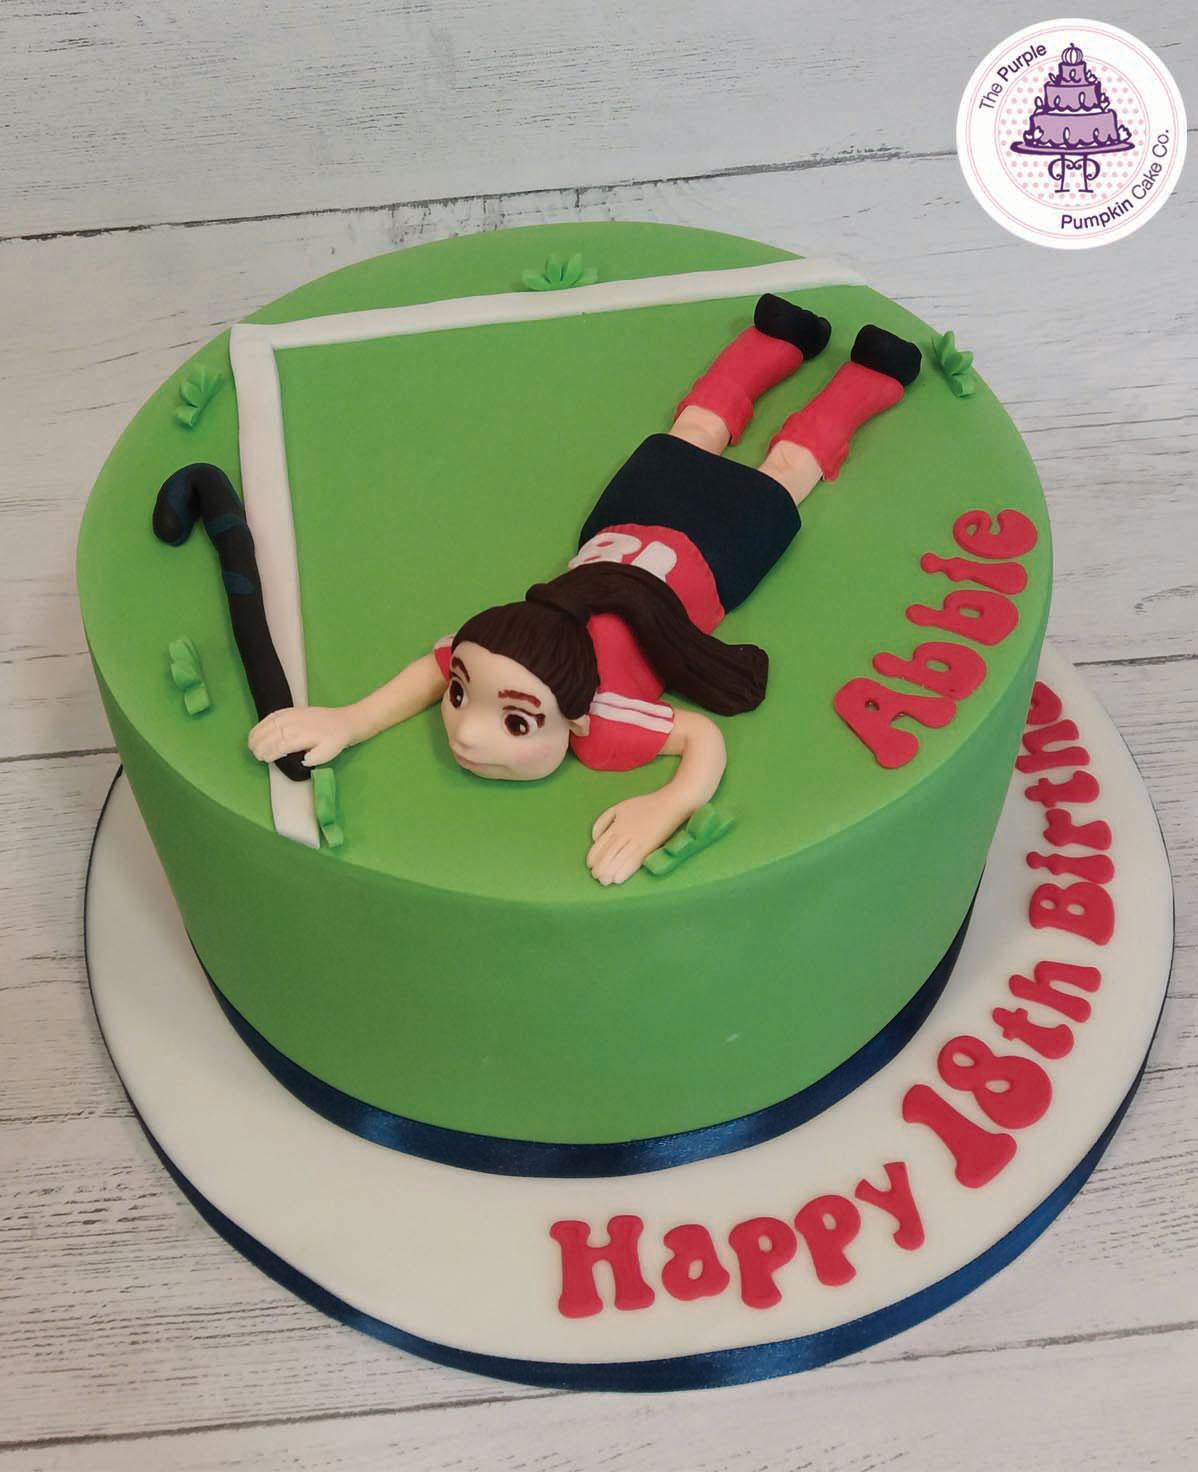 Hockey 18th cake